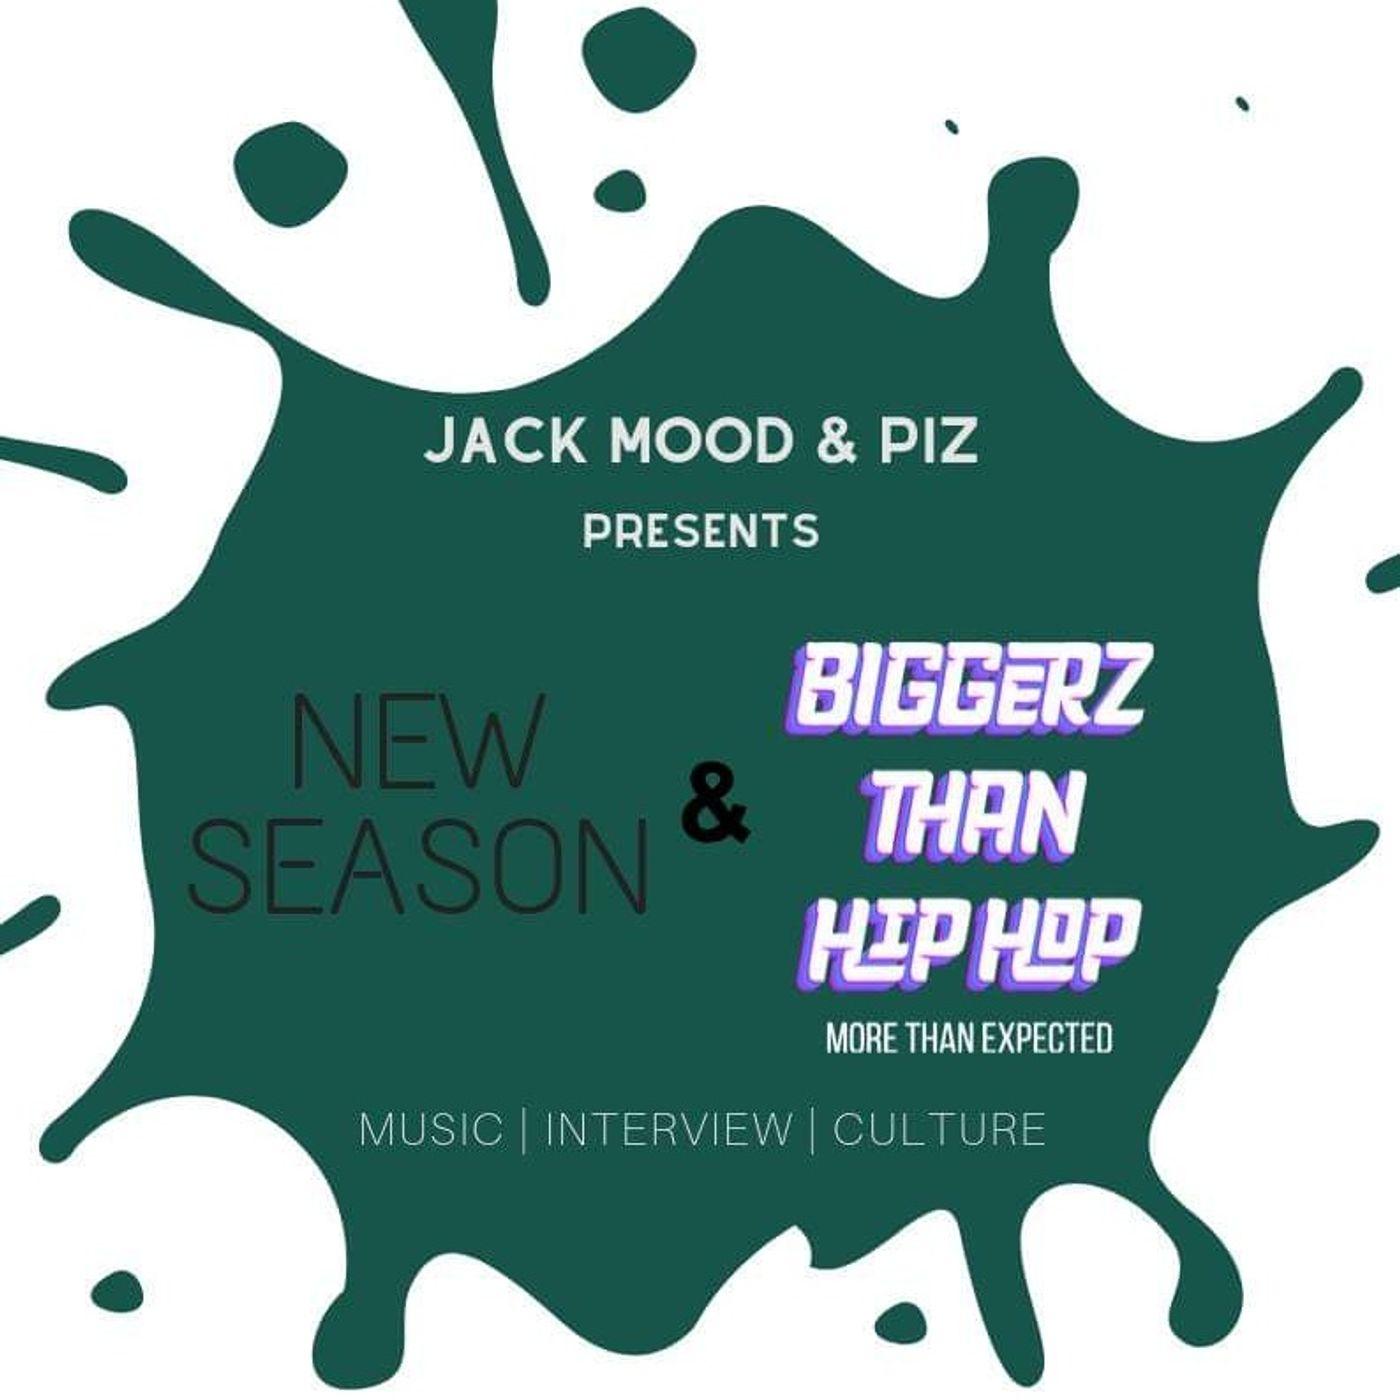 Moder - Jack, Mood & Piz presents Biggerz Than Hip-Hop - s01e04